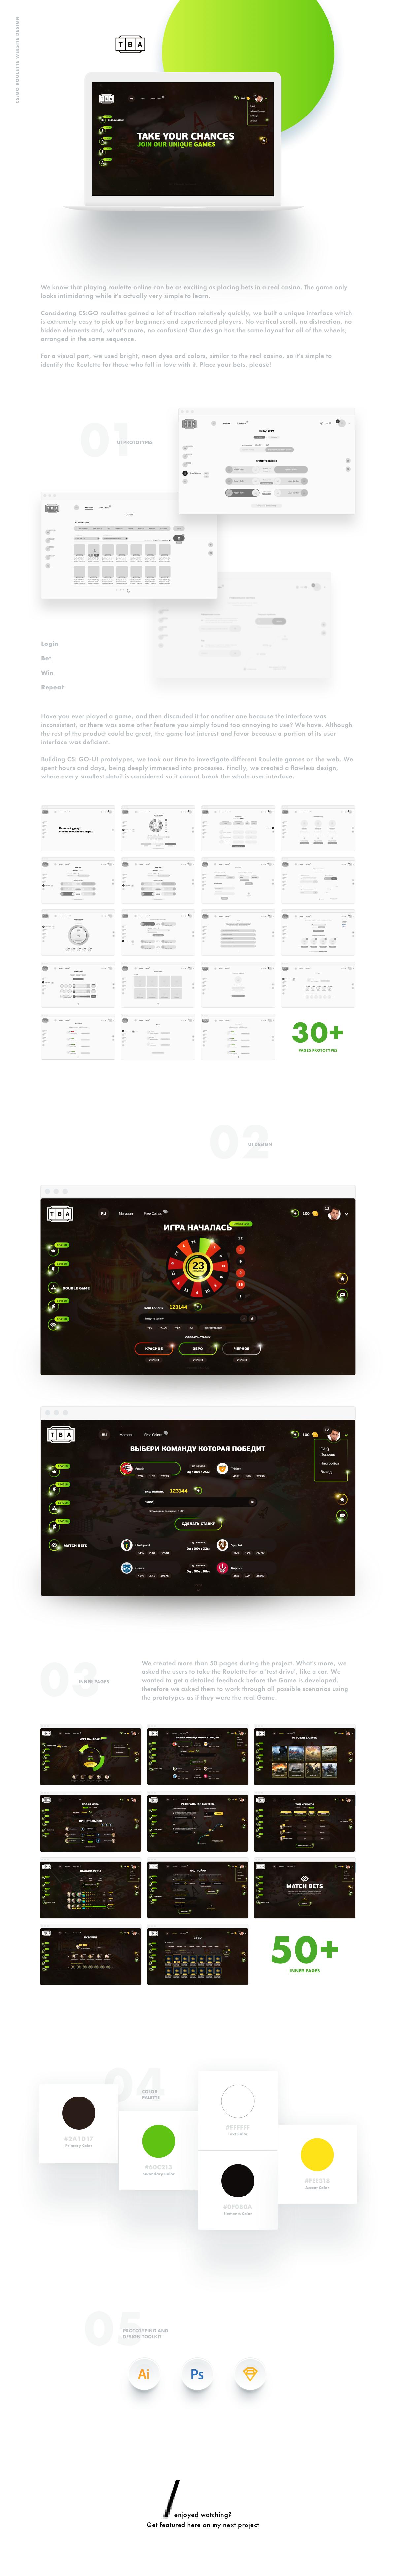 онлайн казино структура